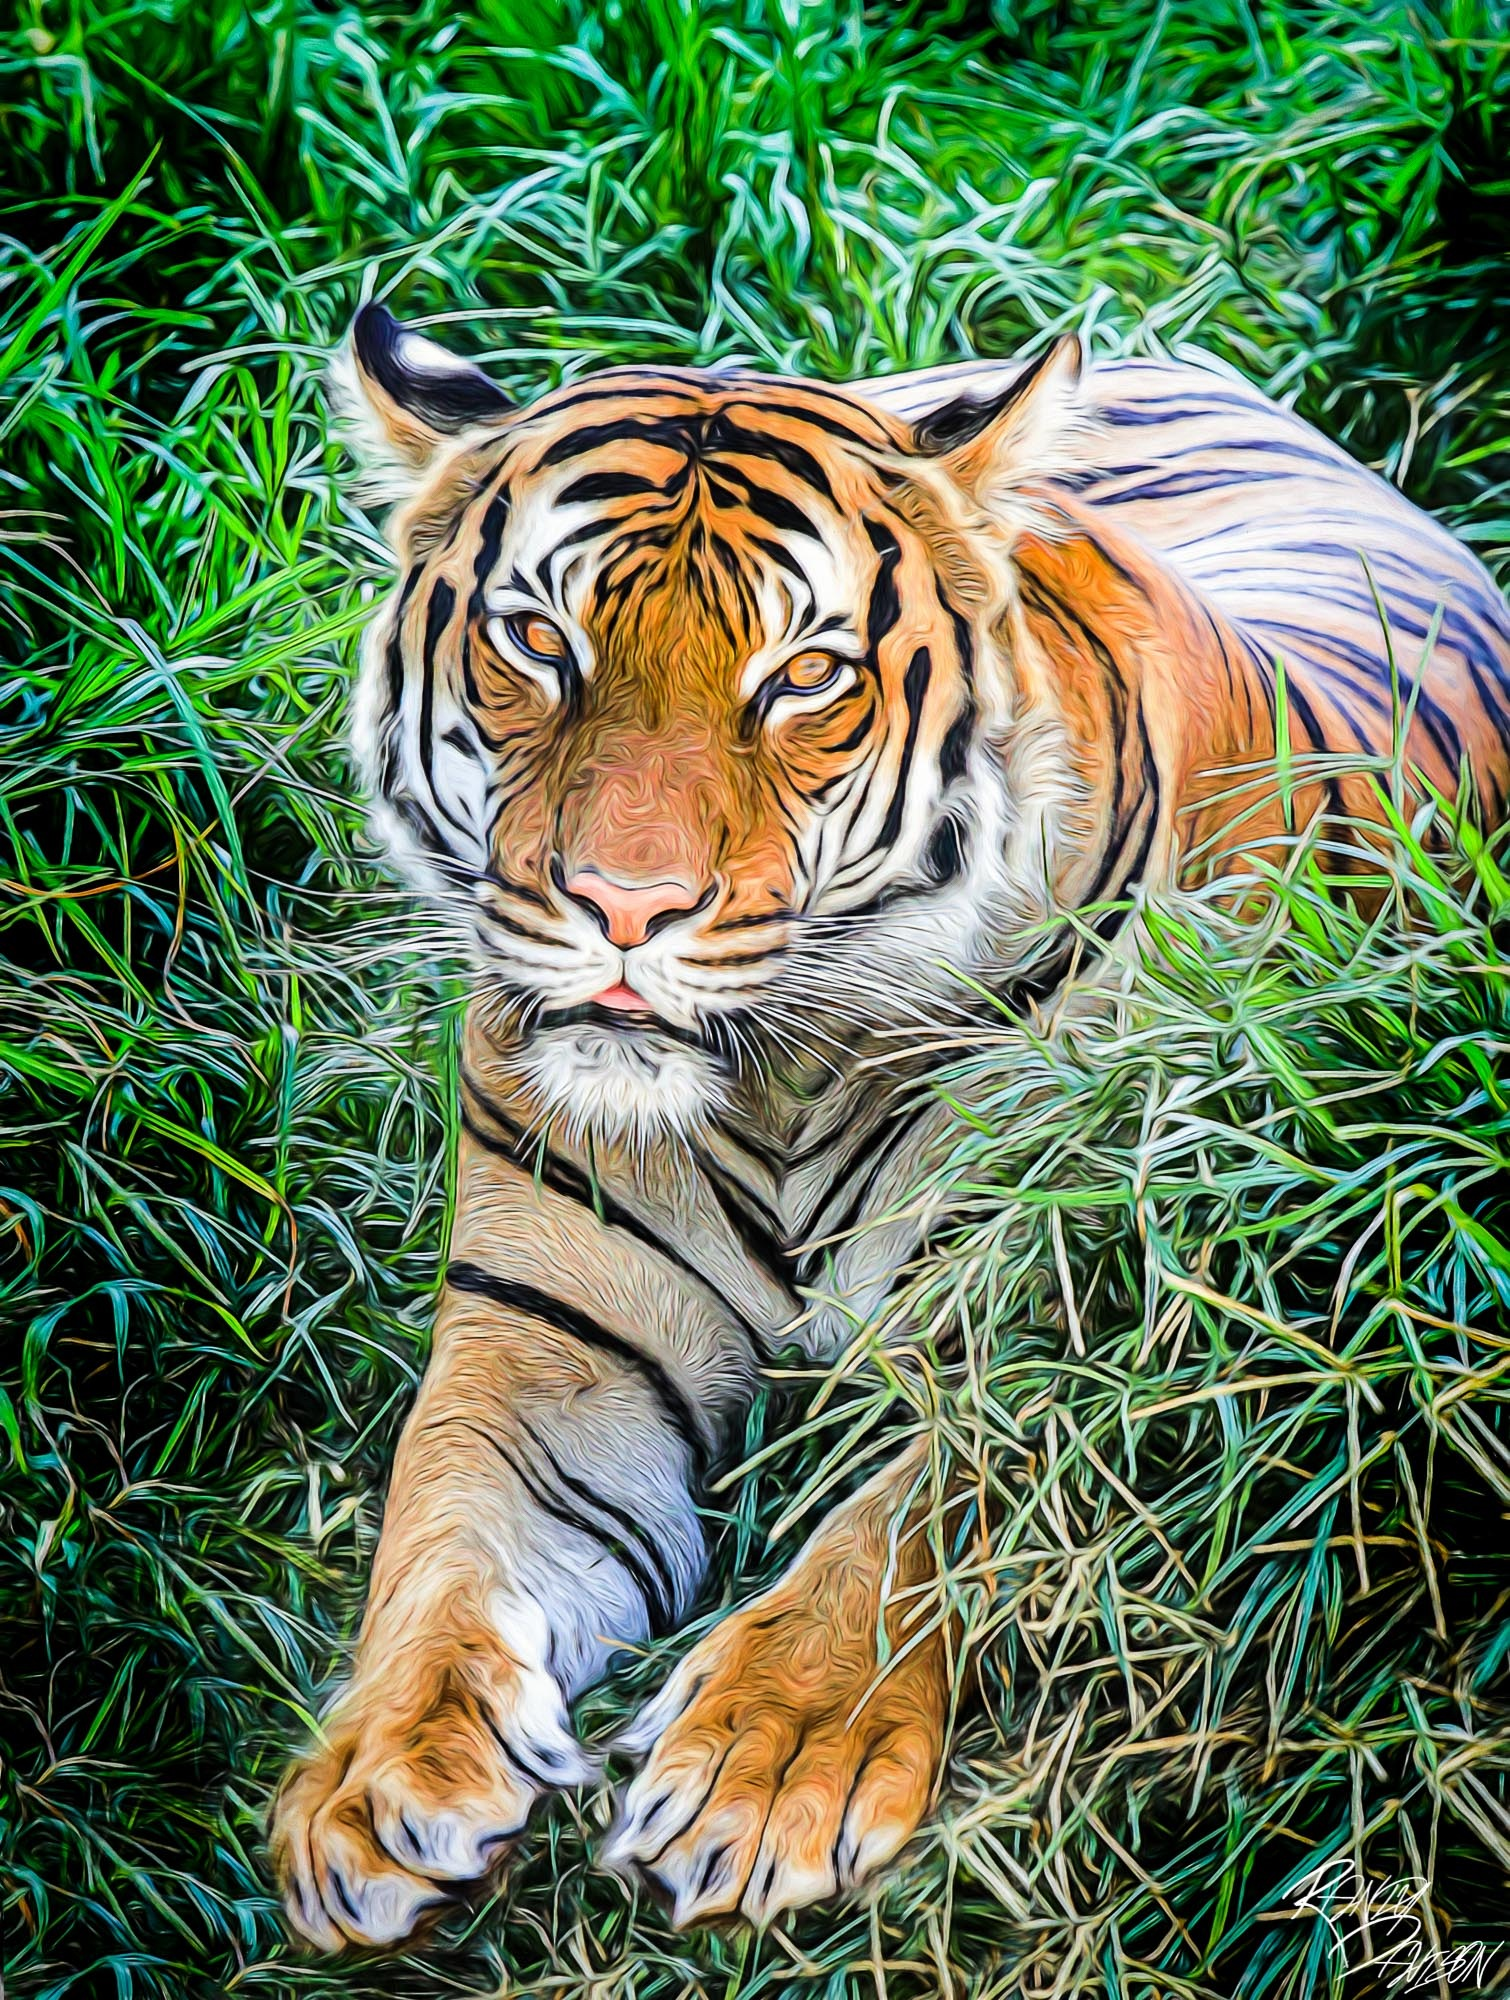 Tiger in the grass by randydavison